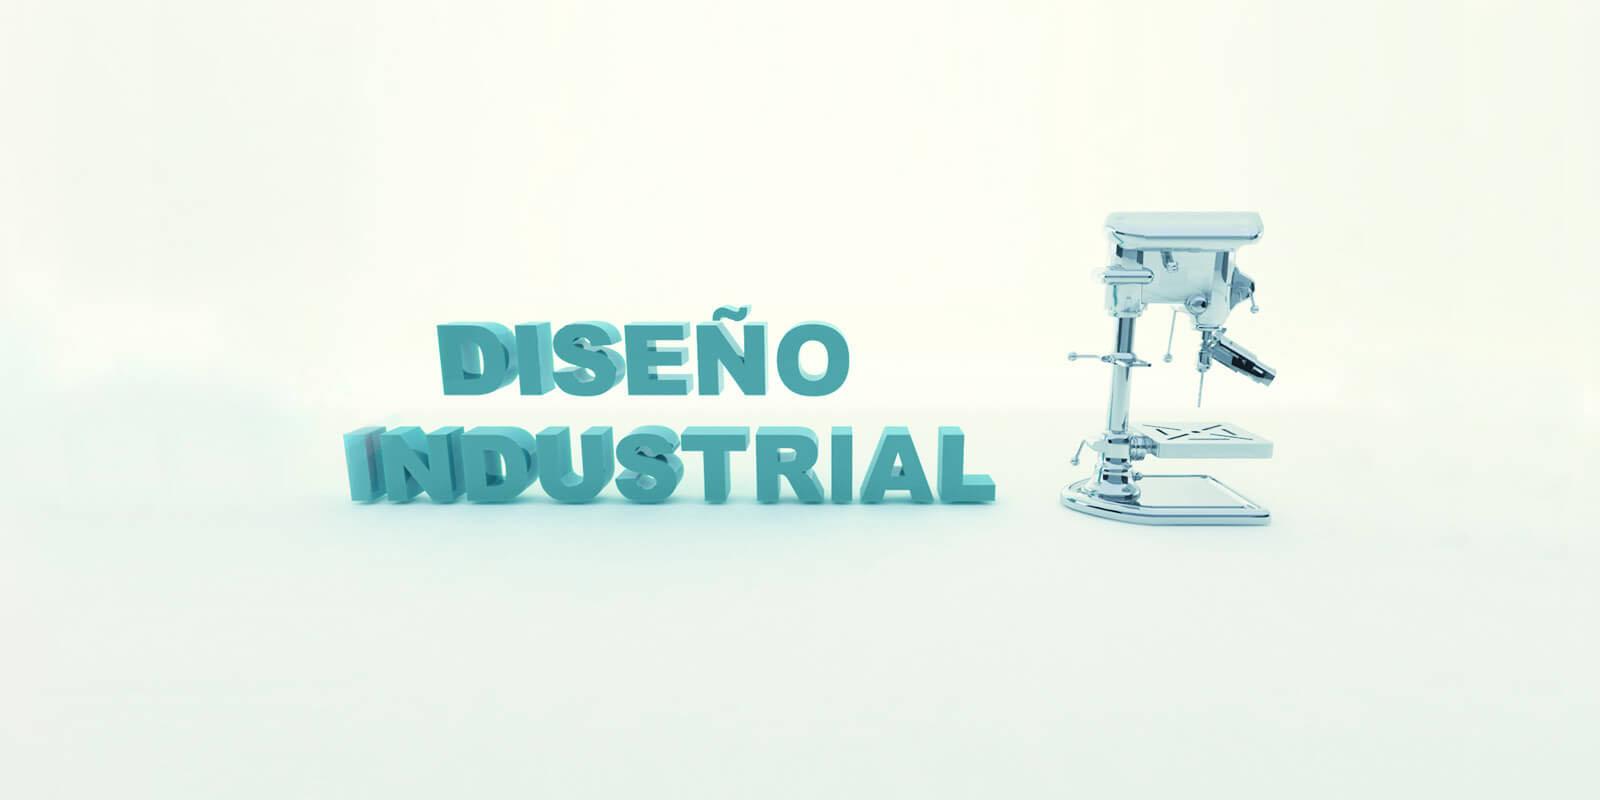 diseño industrial en 3d, taladro industrial en 3d